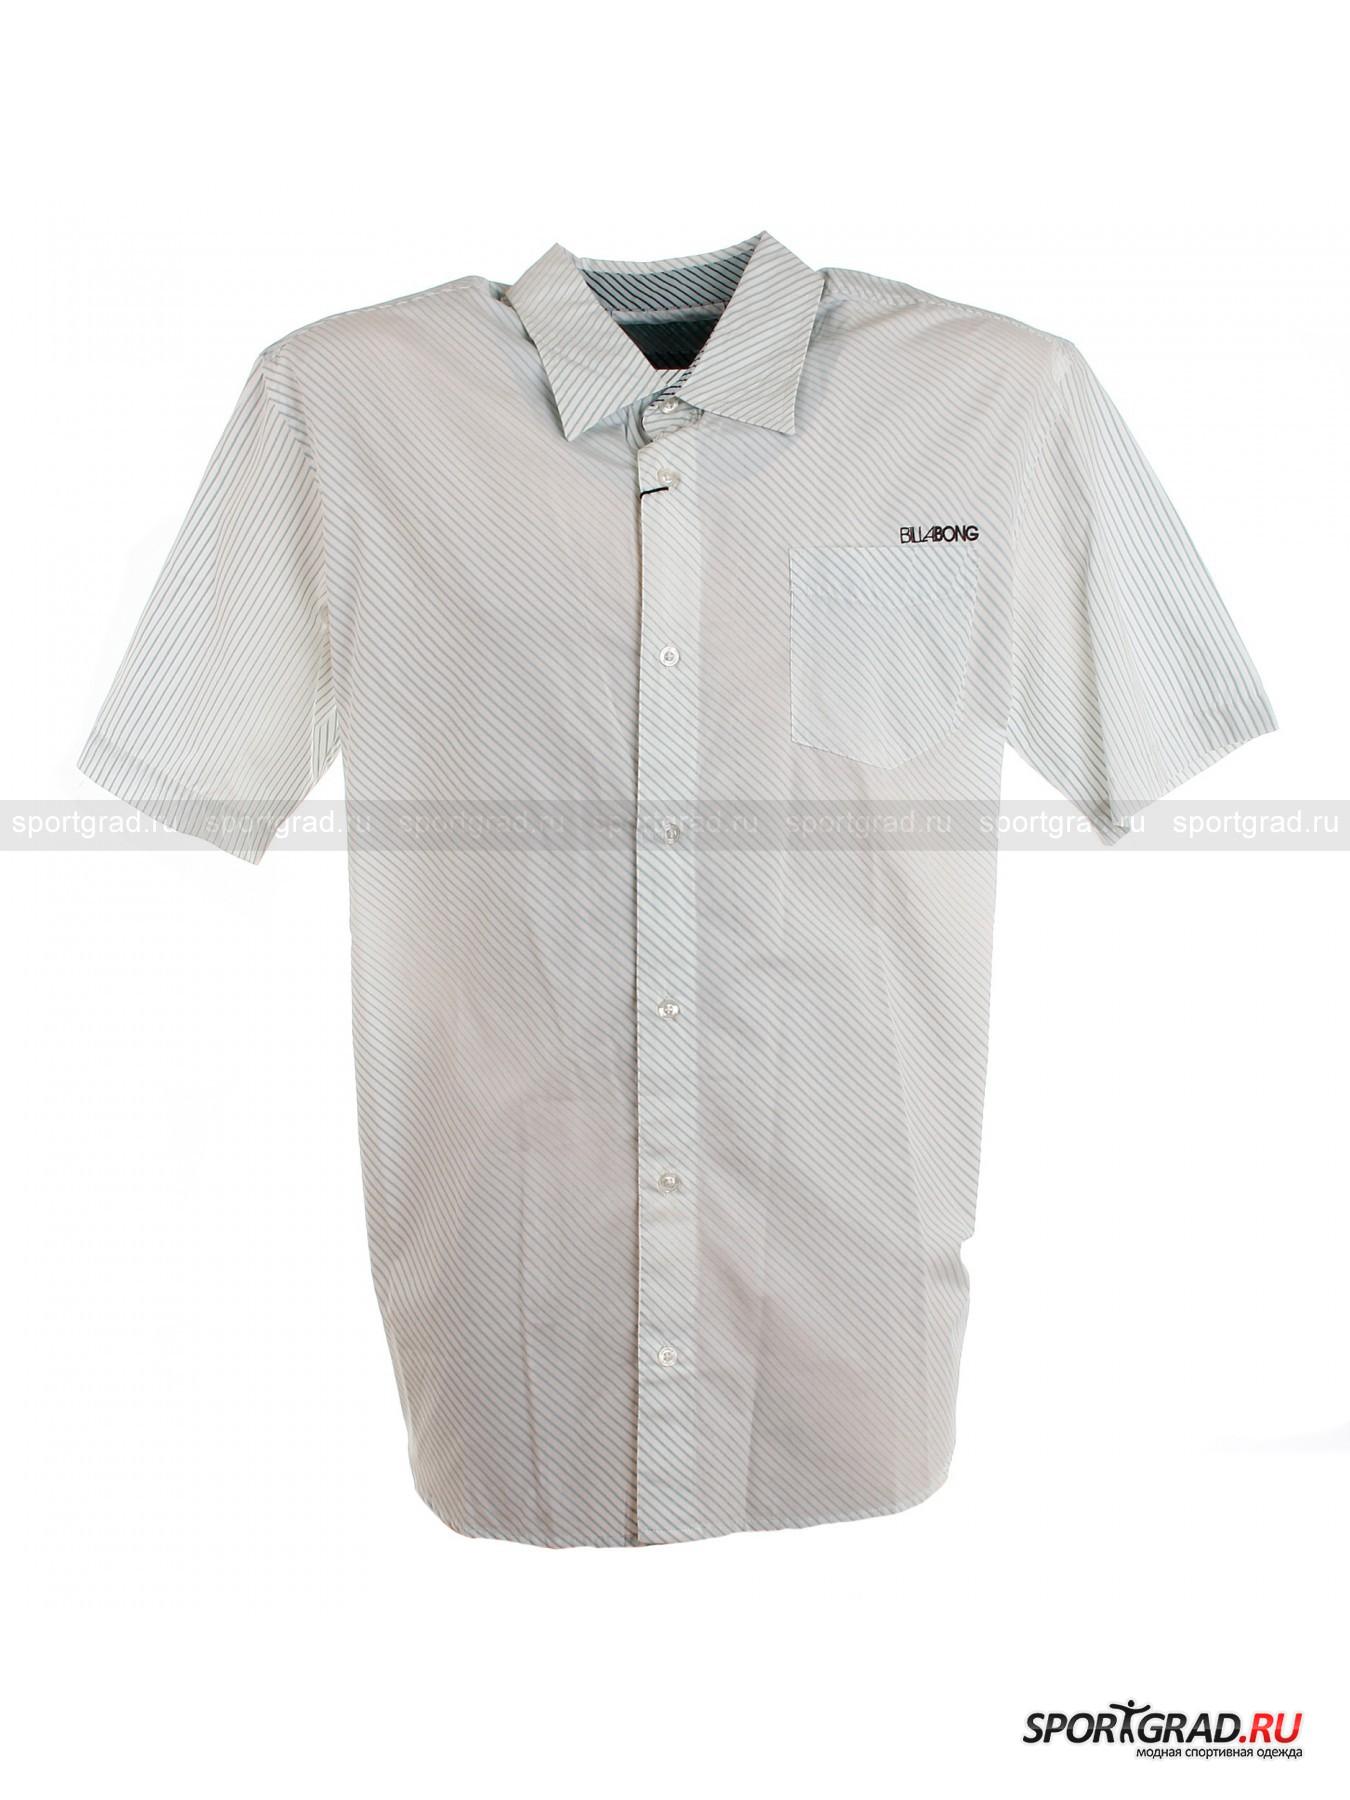 Рубашка мужская BILLABONG Inspire от Спортград